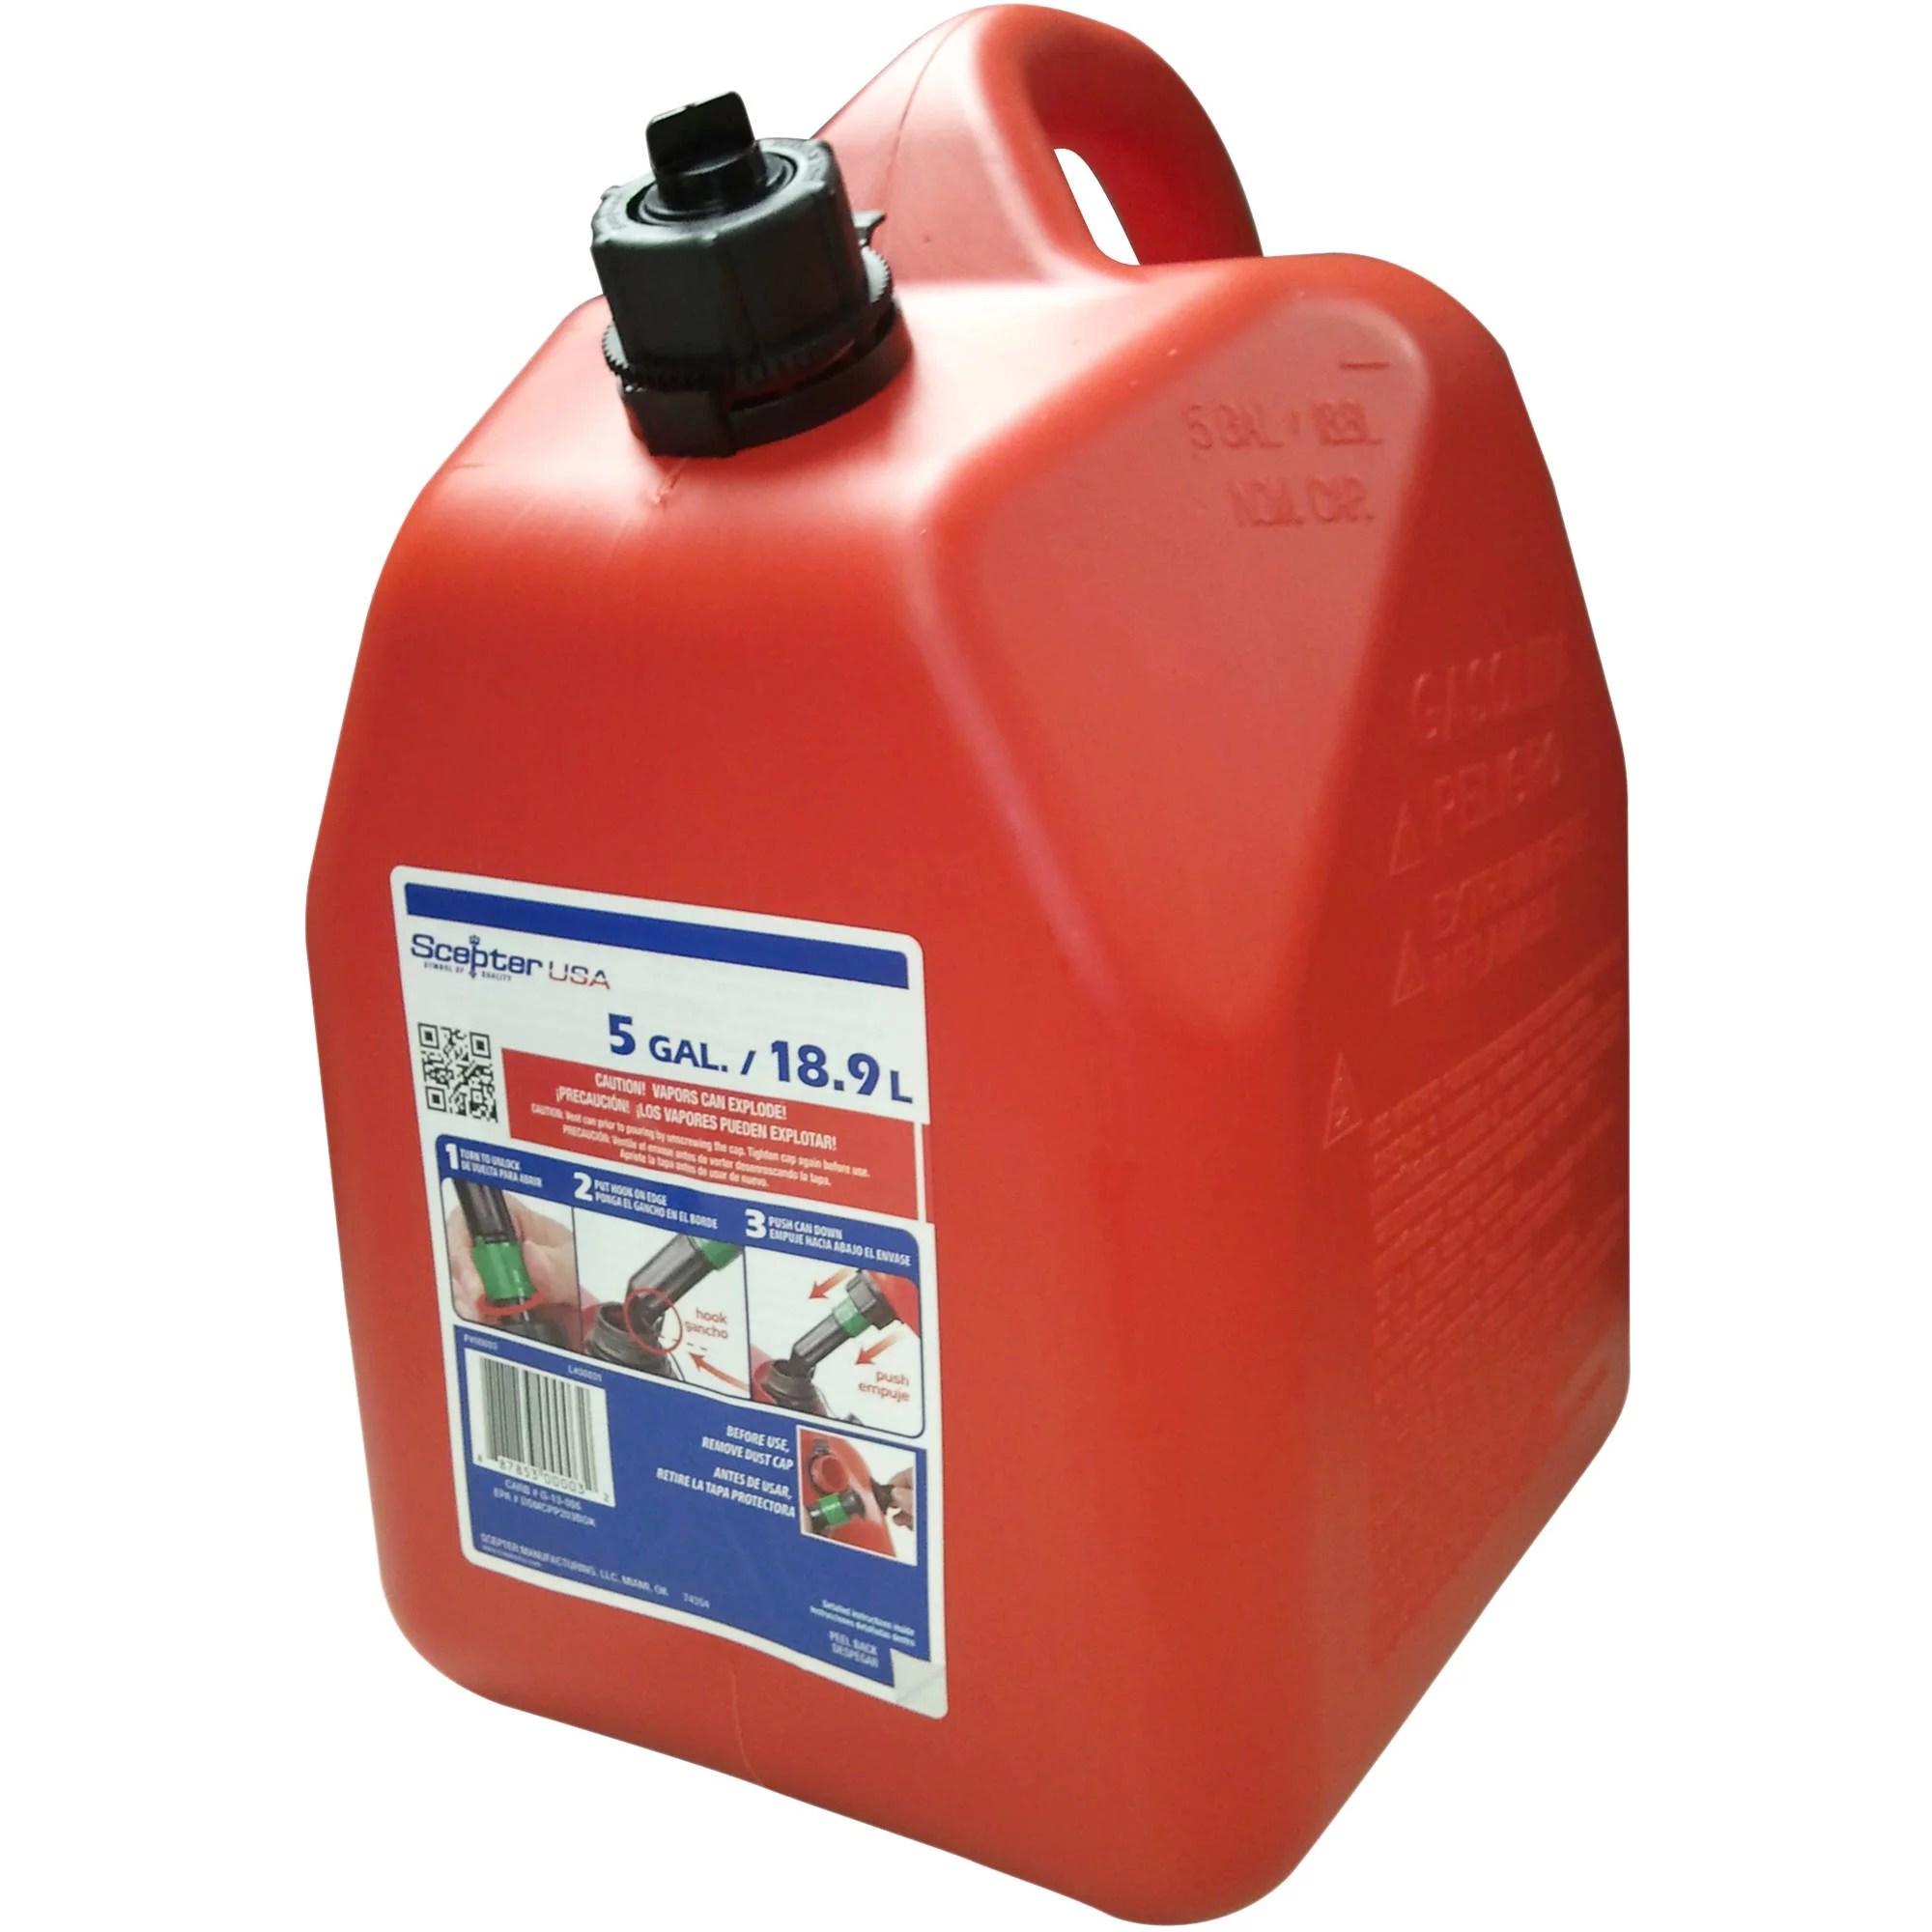 Spout Gallon 3 Can No Walmart Gas Saftey